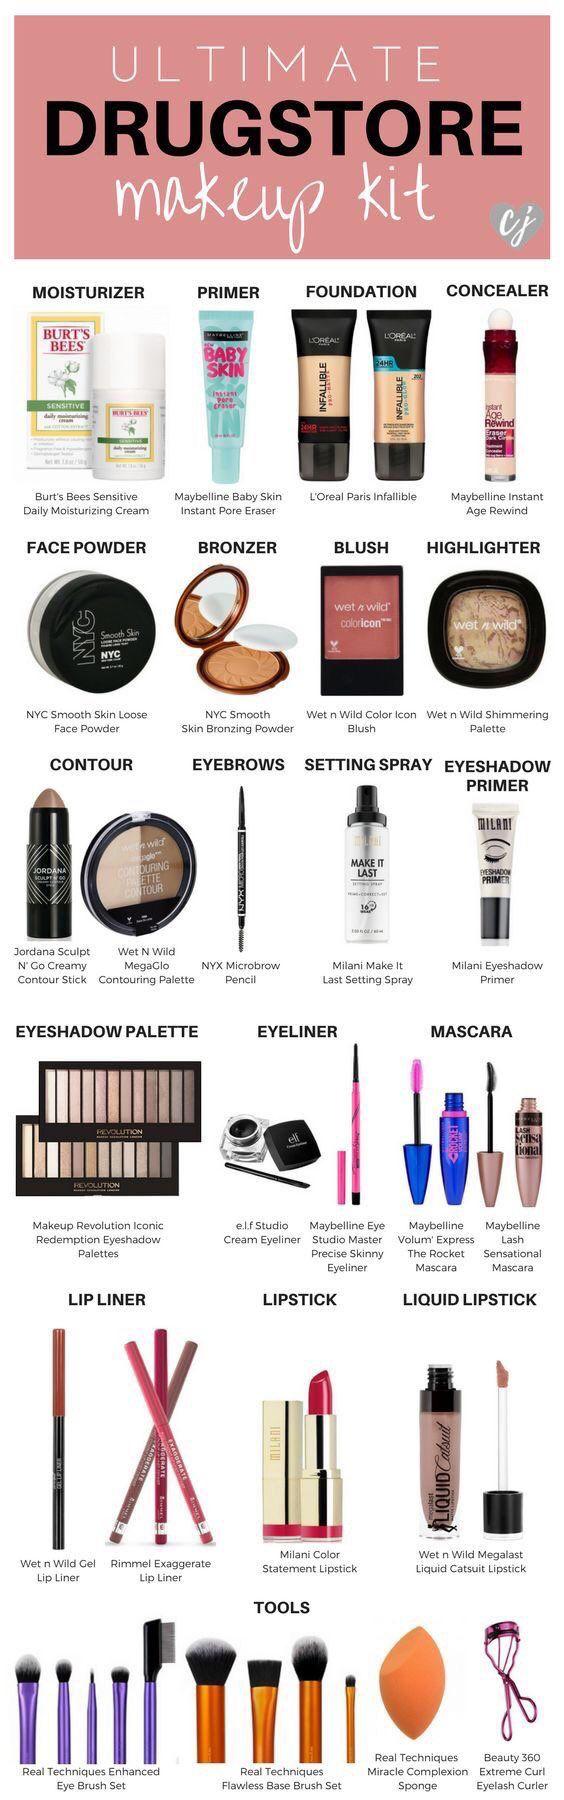 Complete Makeup Kit List - Items Needed